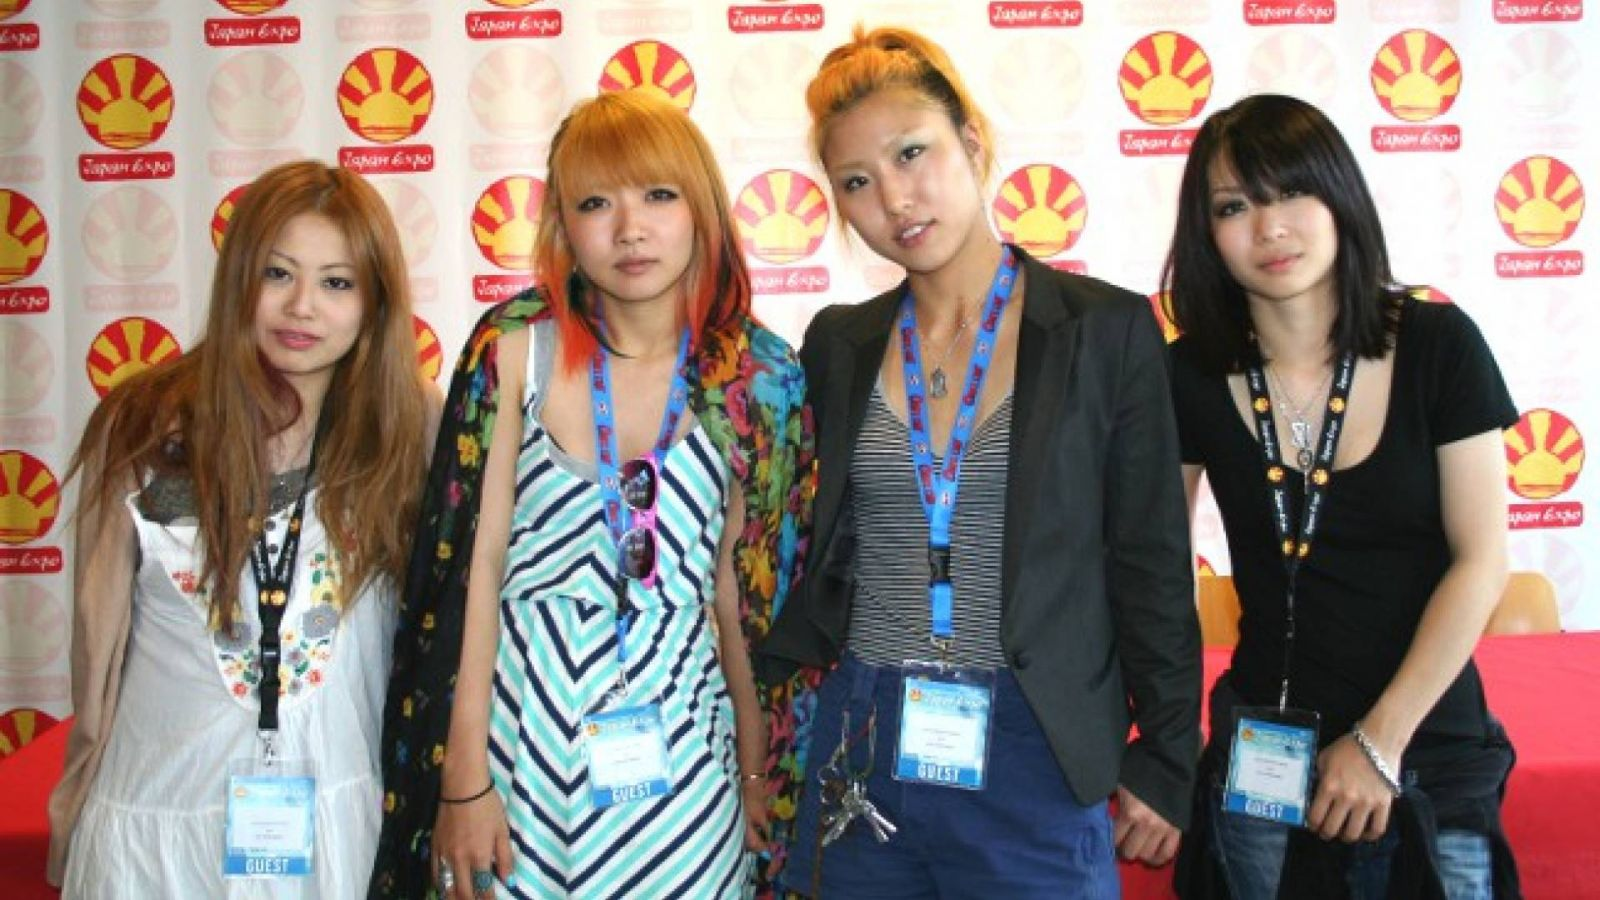 Интервью с LAZYgunsBRISKY на Japan Expo © LAZYgunsBRISKY - Aurore - JAME